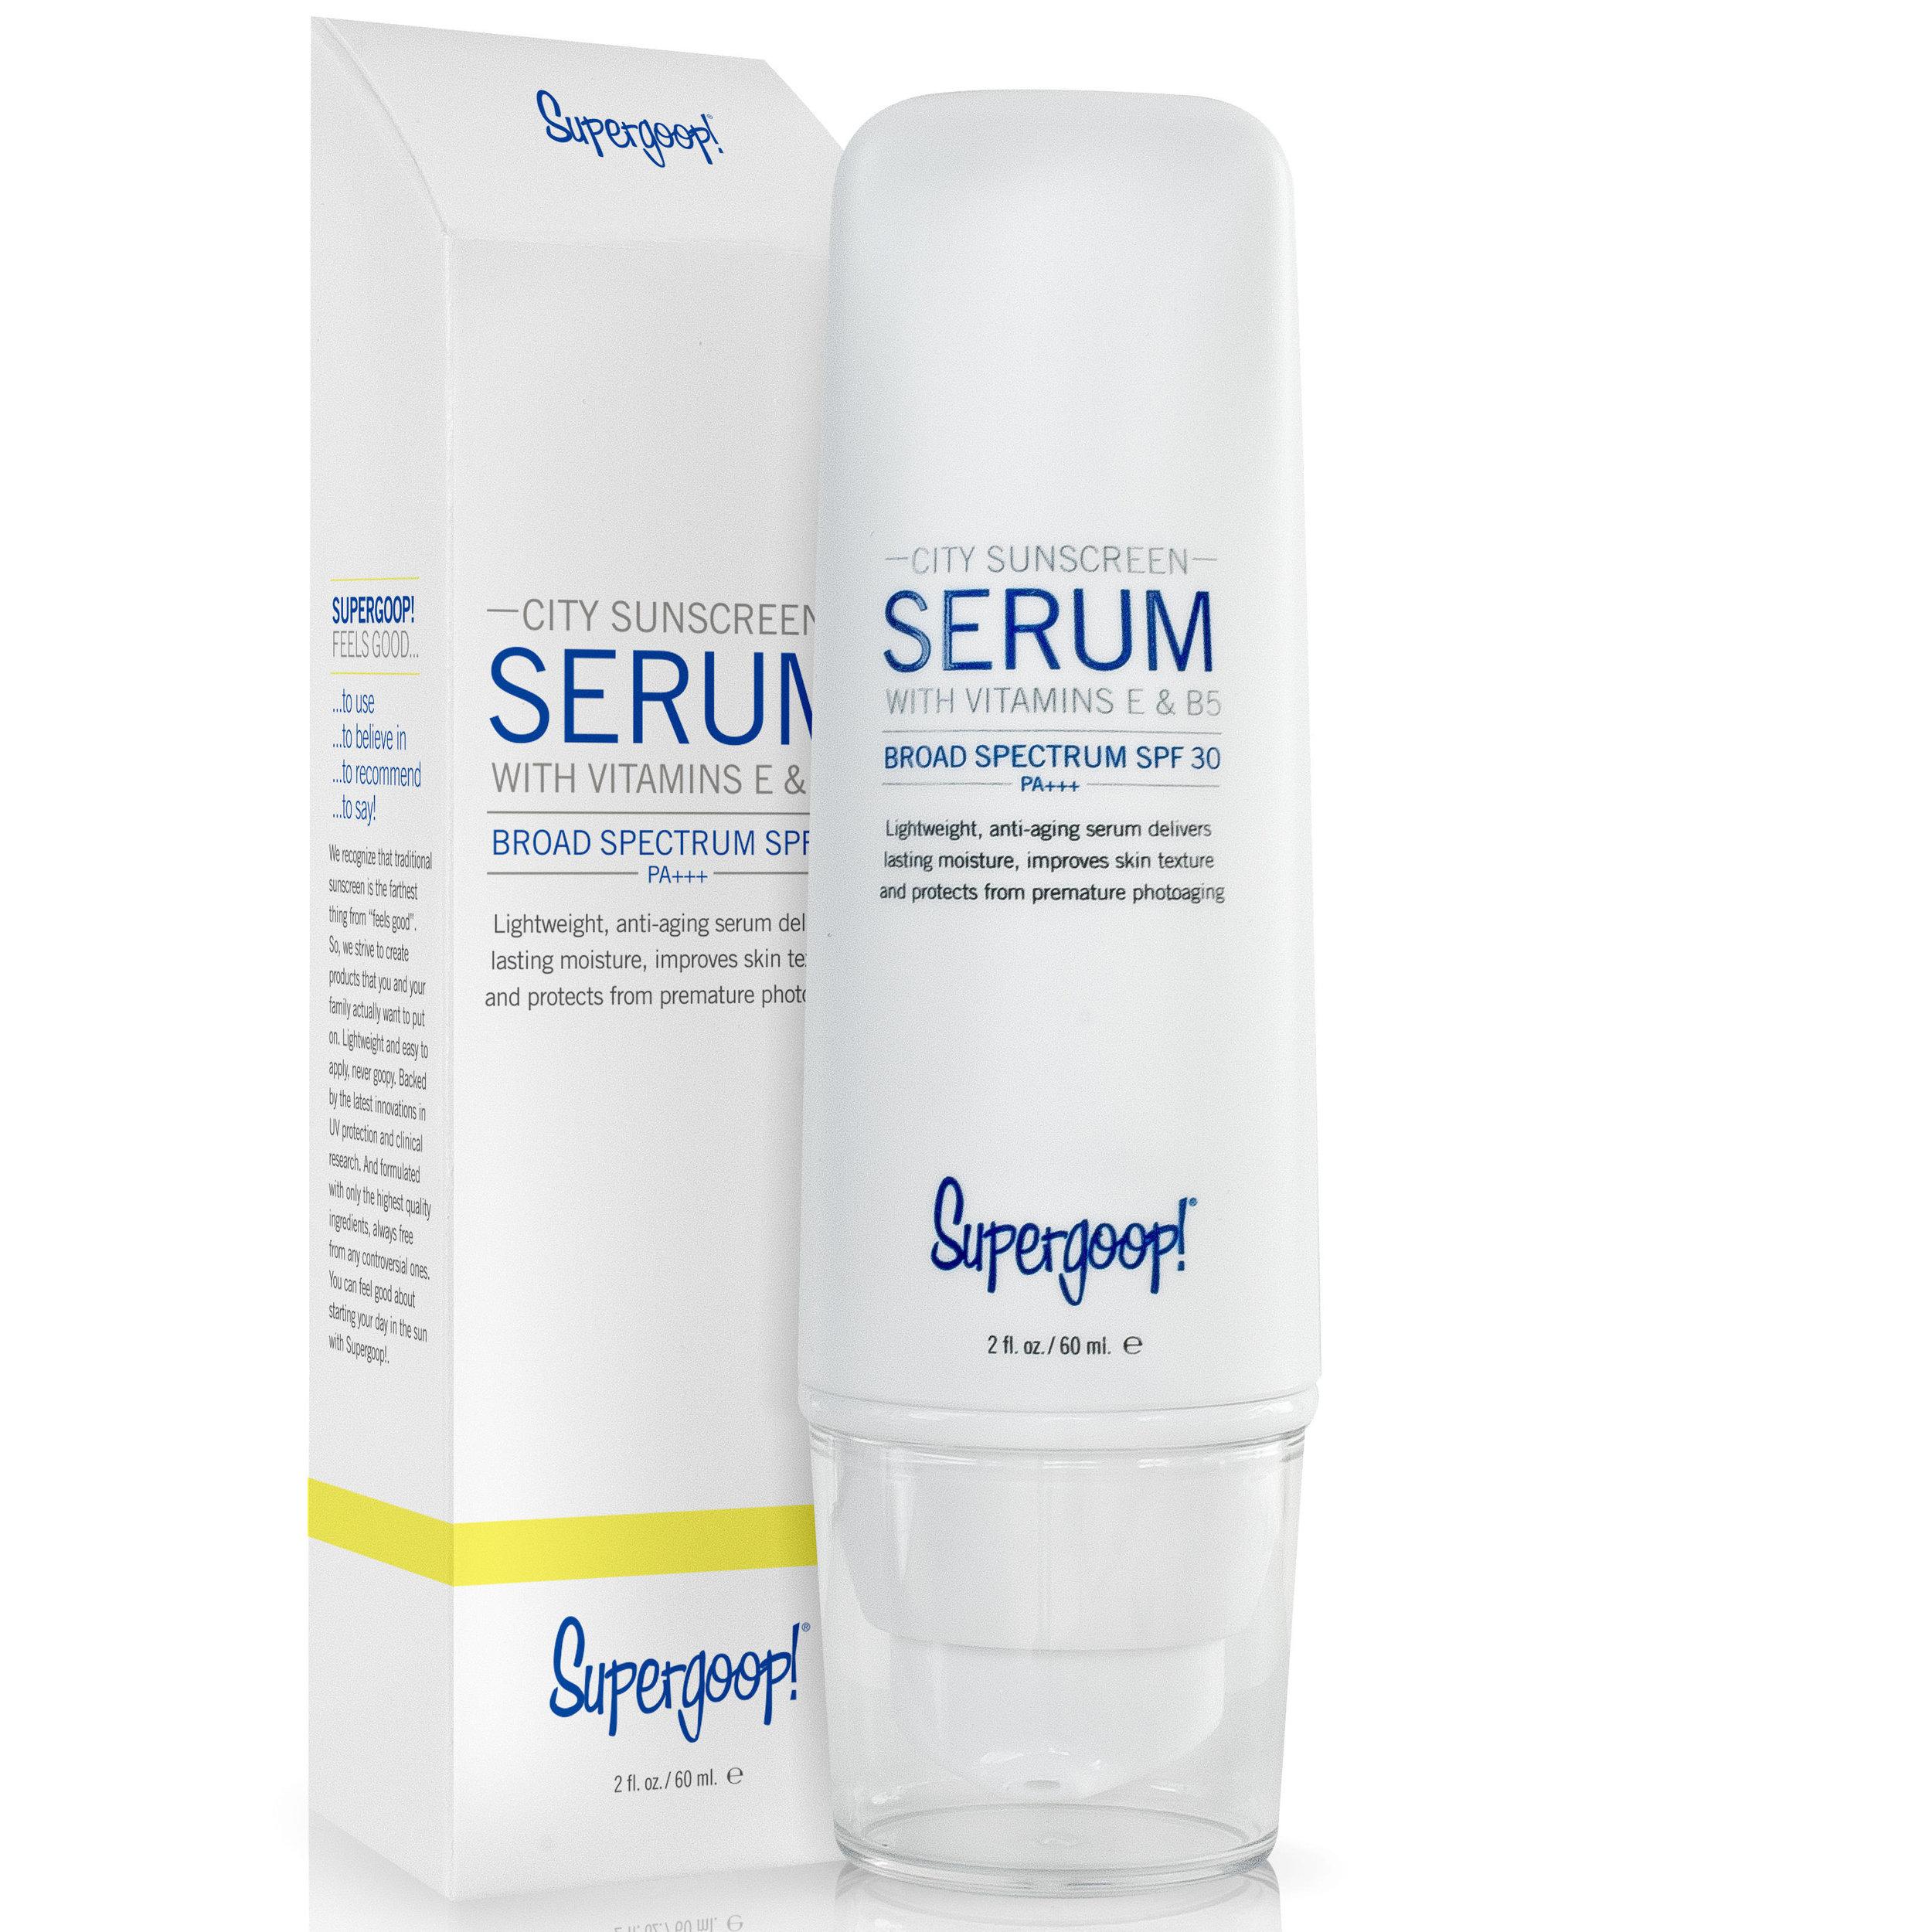 Supergoop Sunscreen Serum (SPF 30) - Shelby: